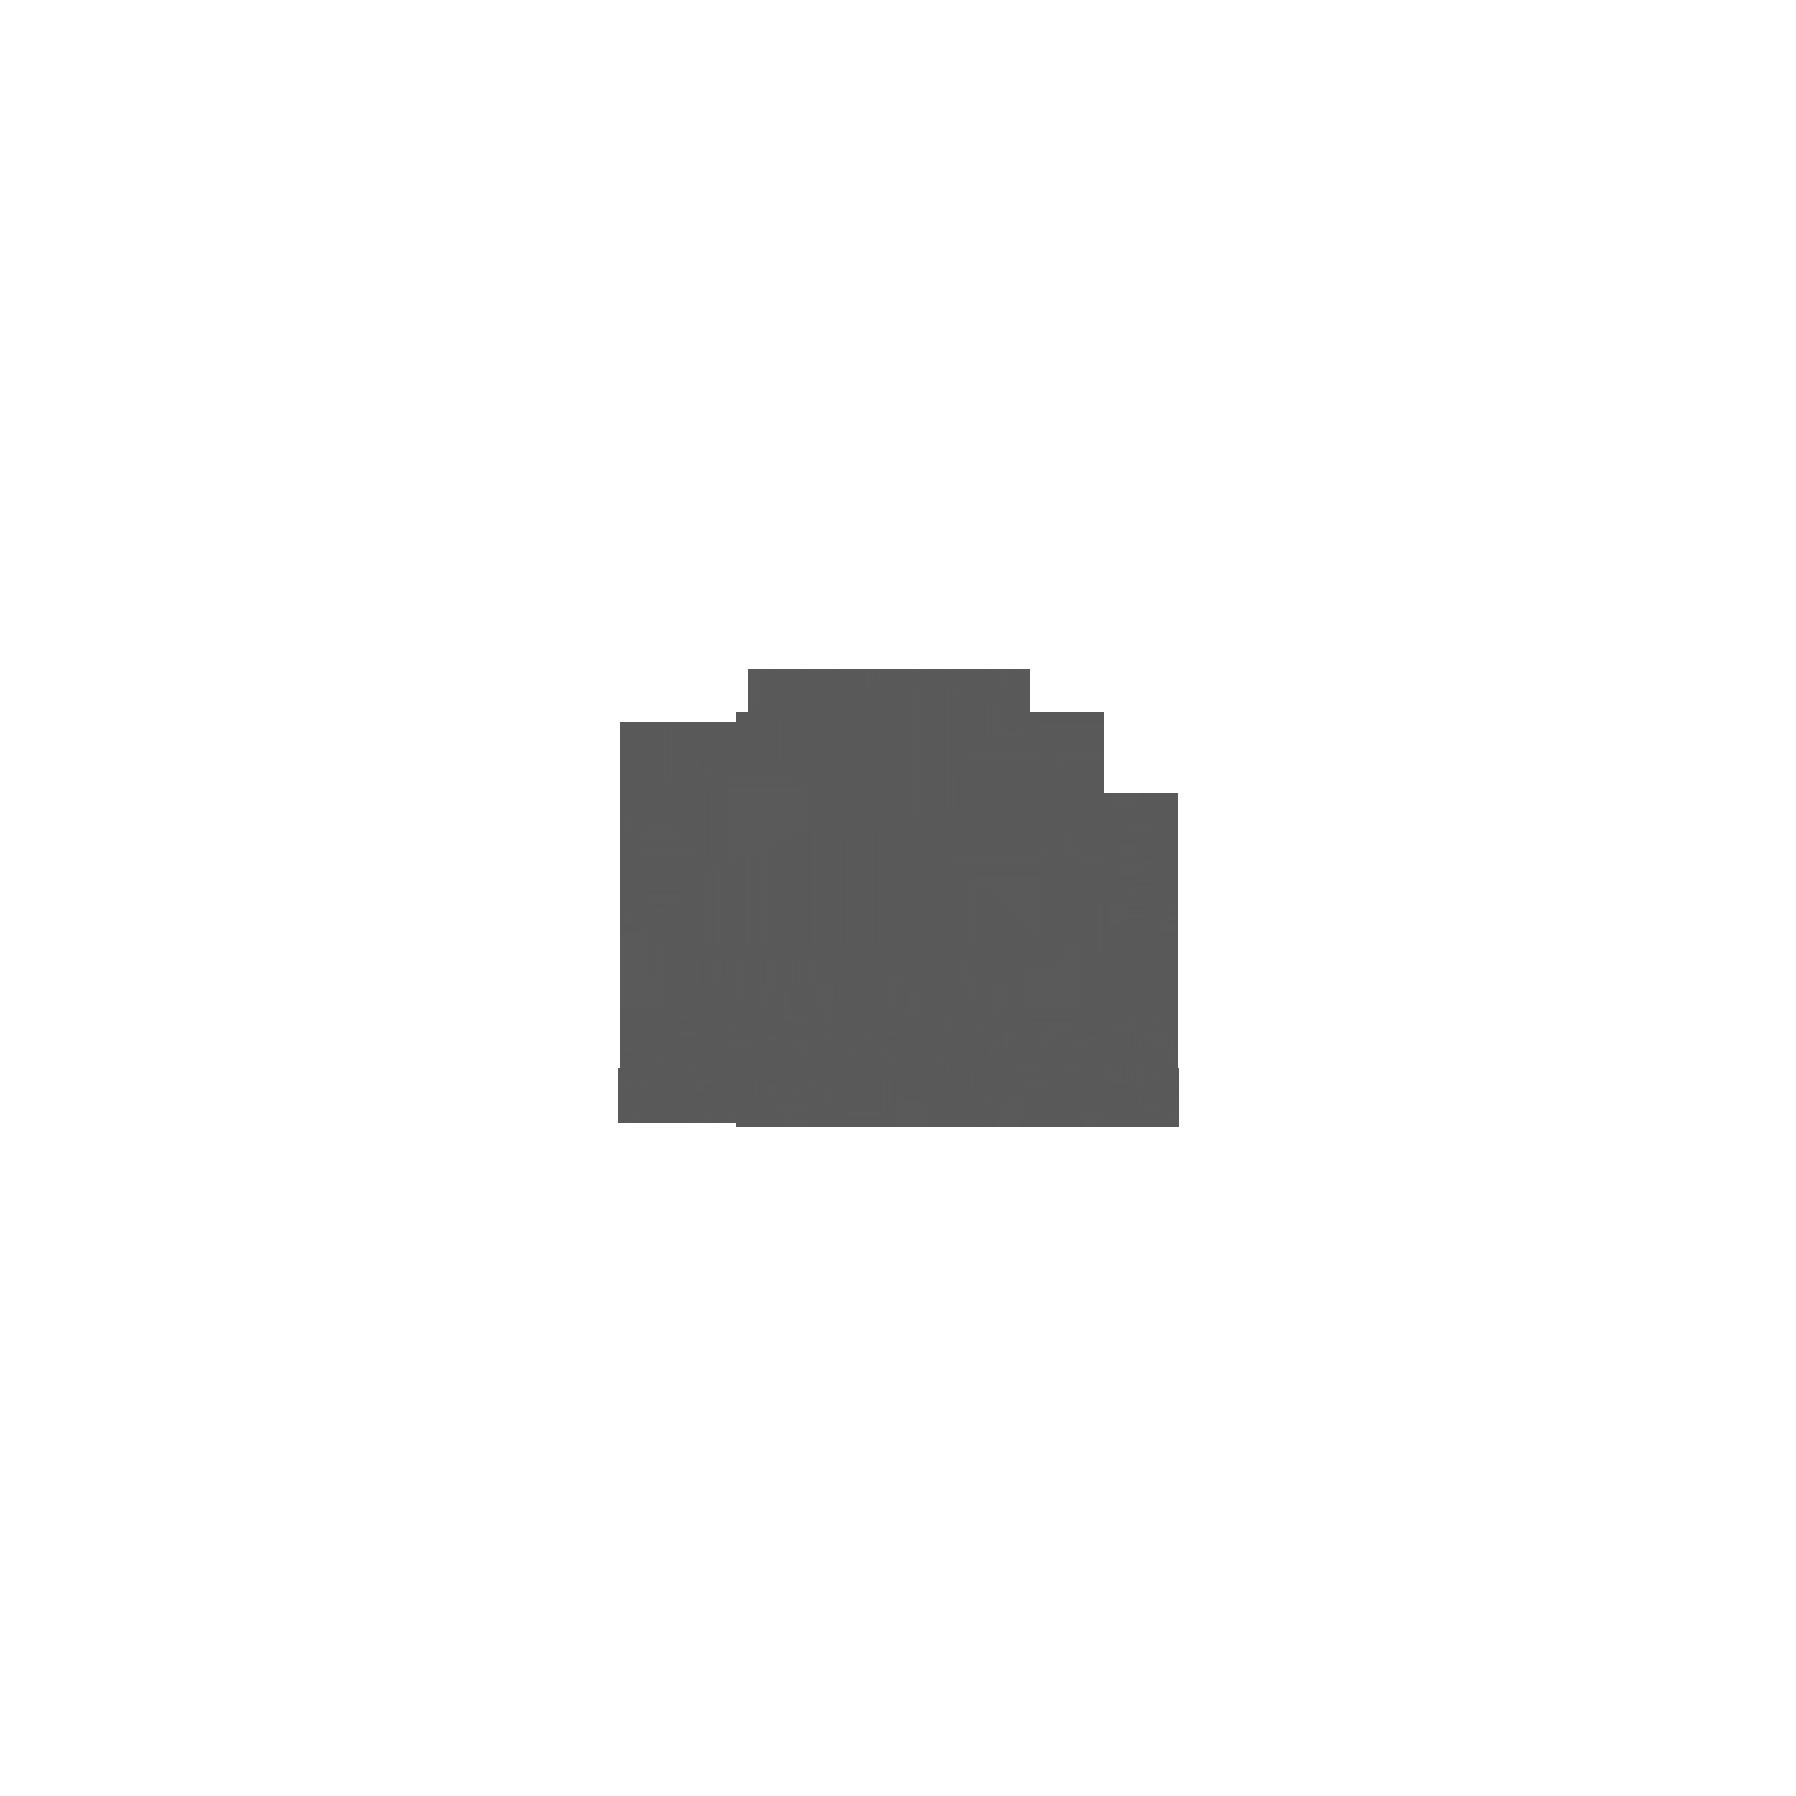 adipsys